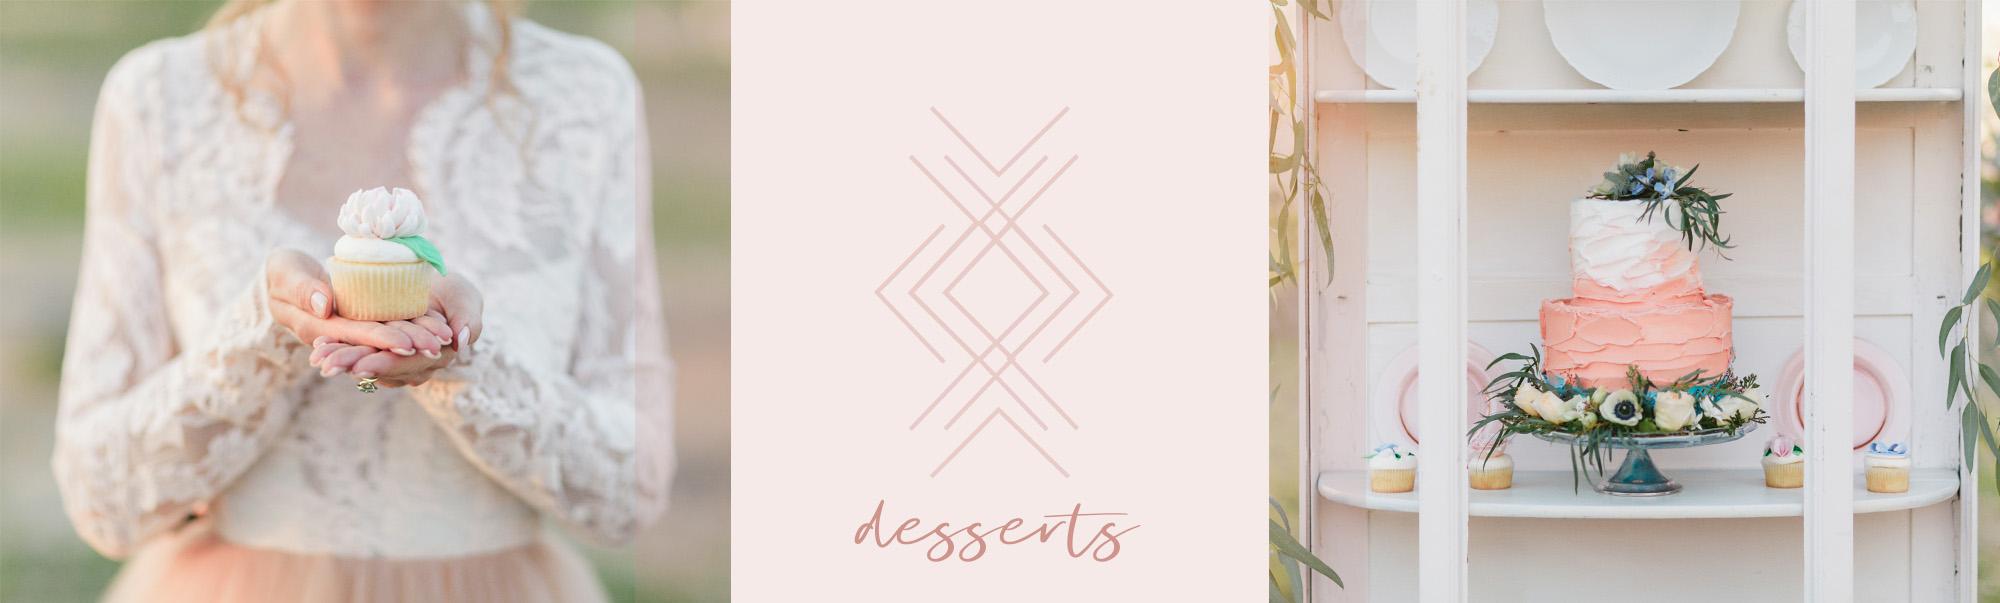 firstcomes_preferred_vendors_DESSERTS.jpg